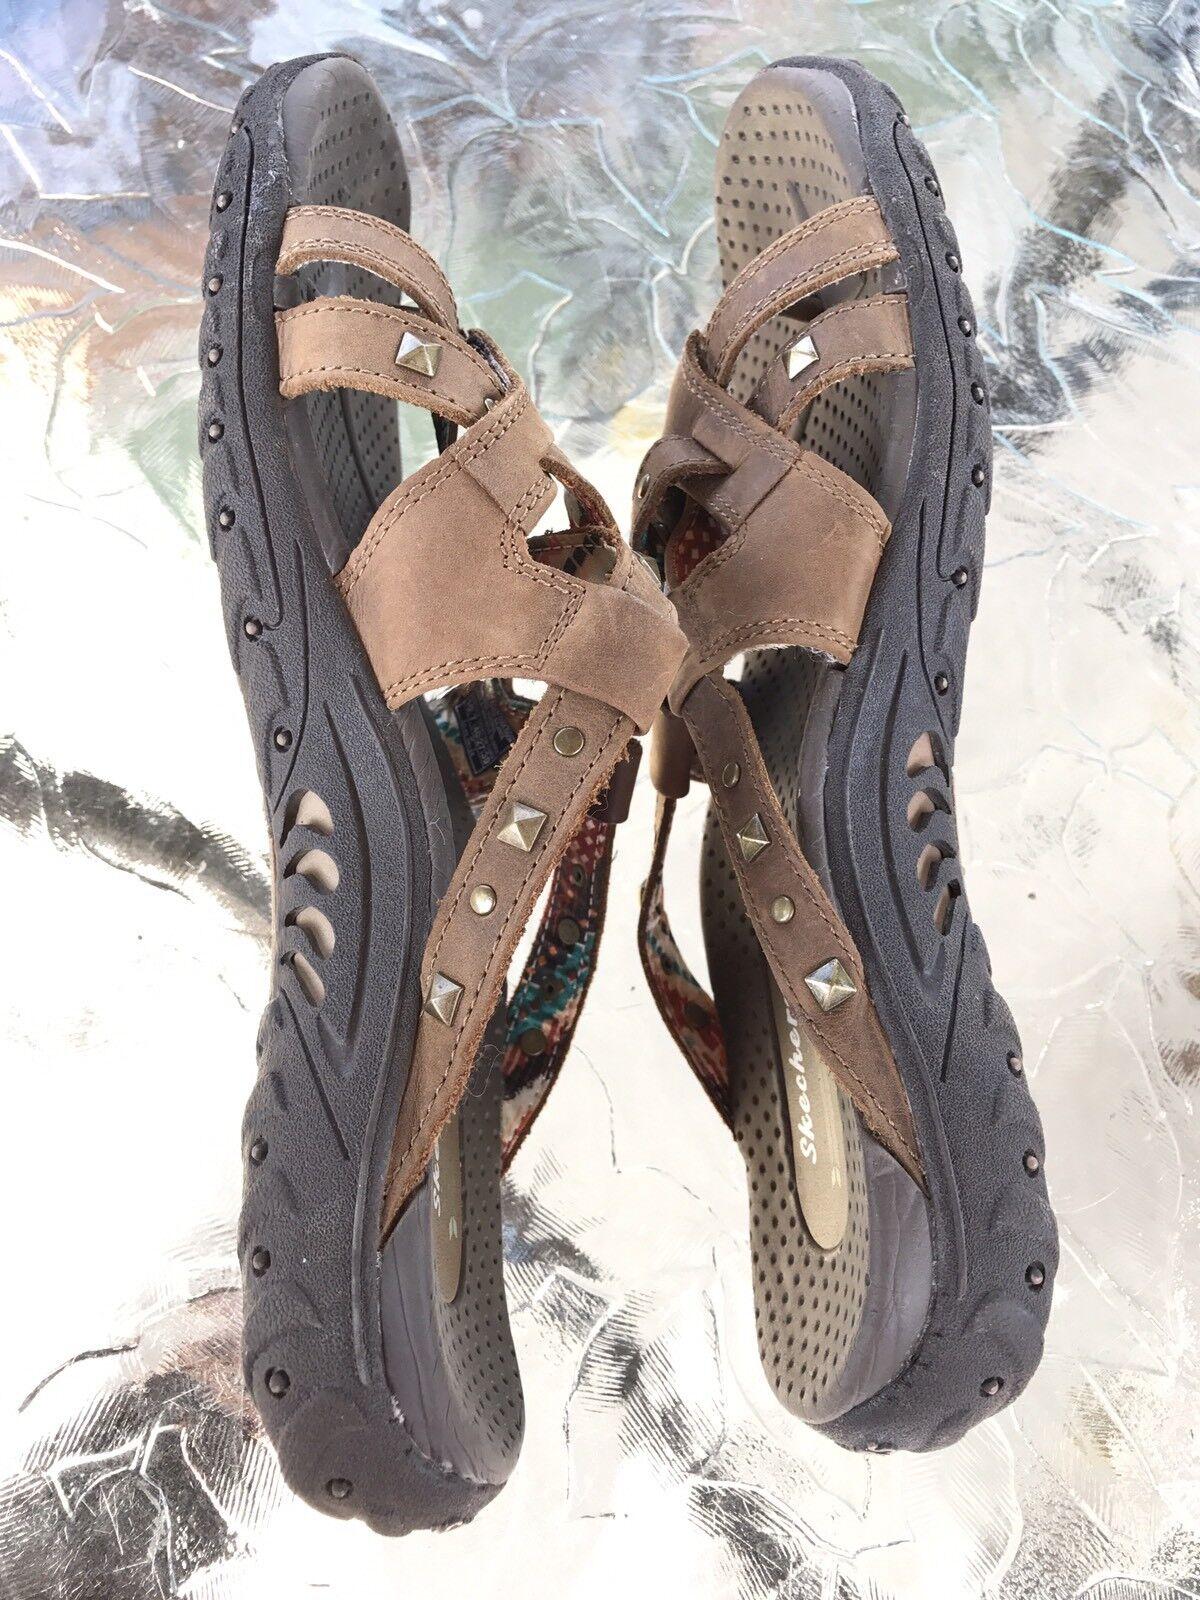 Skechers 10 Reggae Leather Studded Sandals Euc Flip Flip Flip Flips e5a1b9